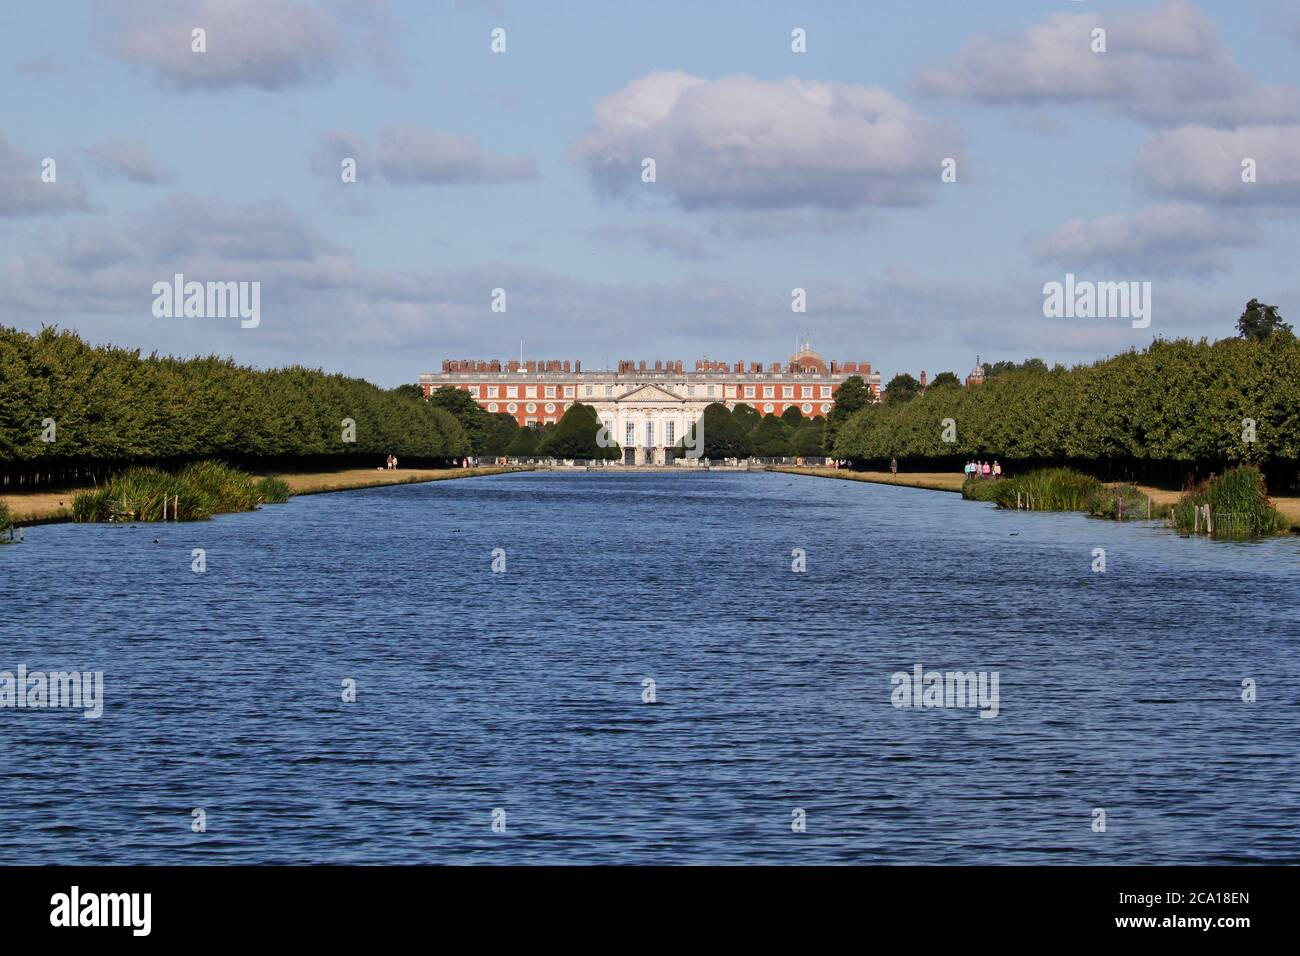 Hampton Court Palace (East Front) von Long Water, Home Park, Hampton Court, East Molesey, Surrey, England, Großbritannien, Großbritannien, Großbritannien, Großbritannien, Europa Stockfoto